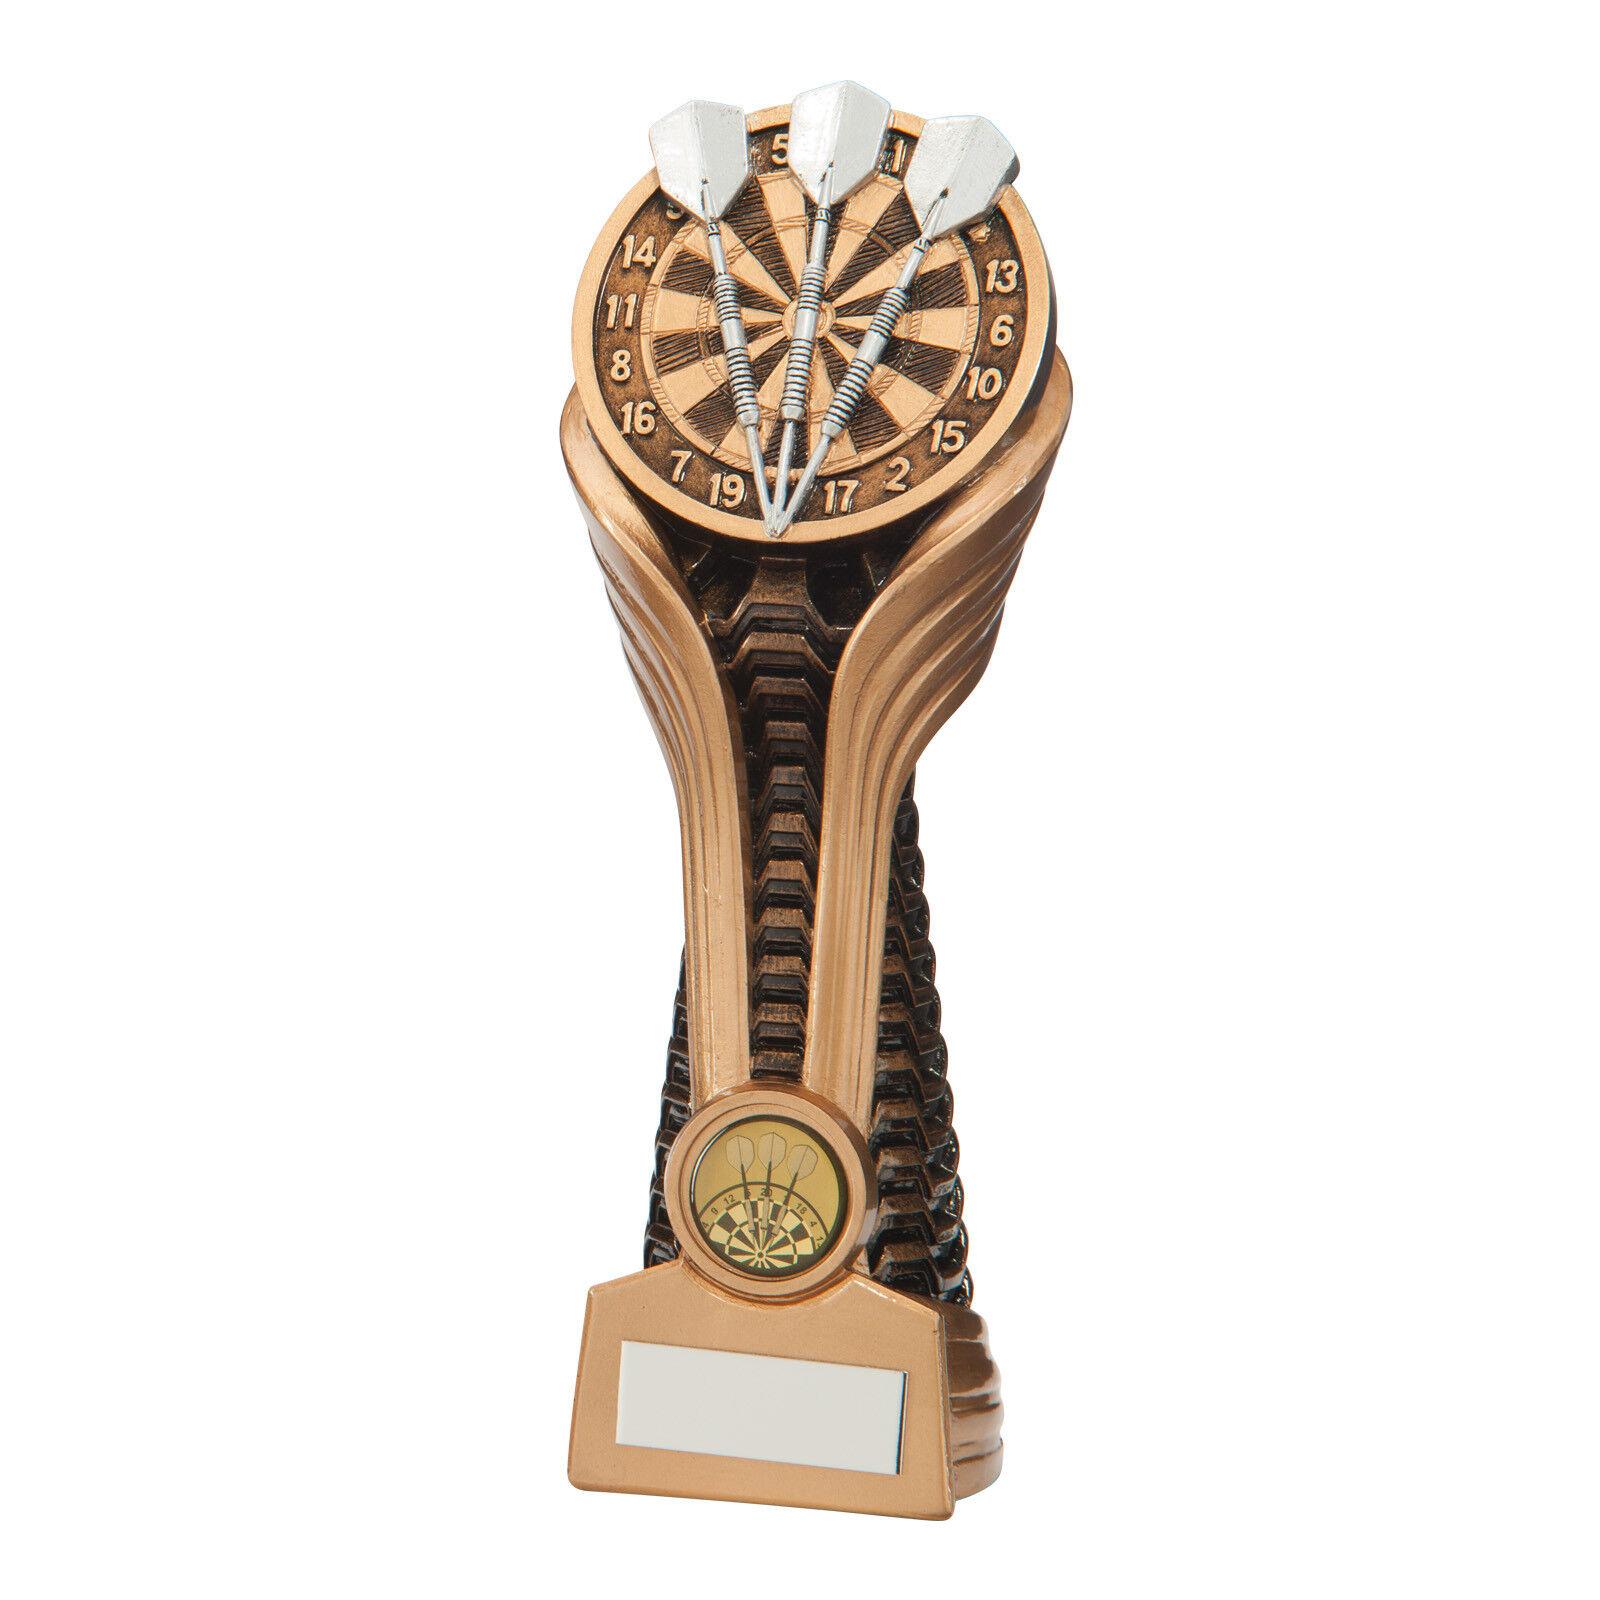 Resin Gauntlet Dartboard Dartboard Dartboard Fléchettes Trophies Awards 3 Sizes Free engraving f0c5fb